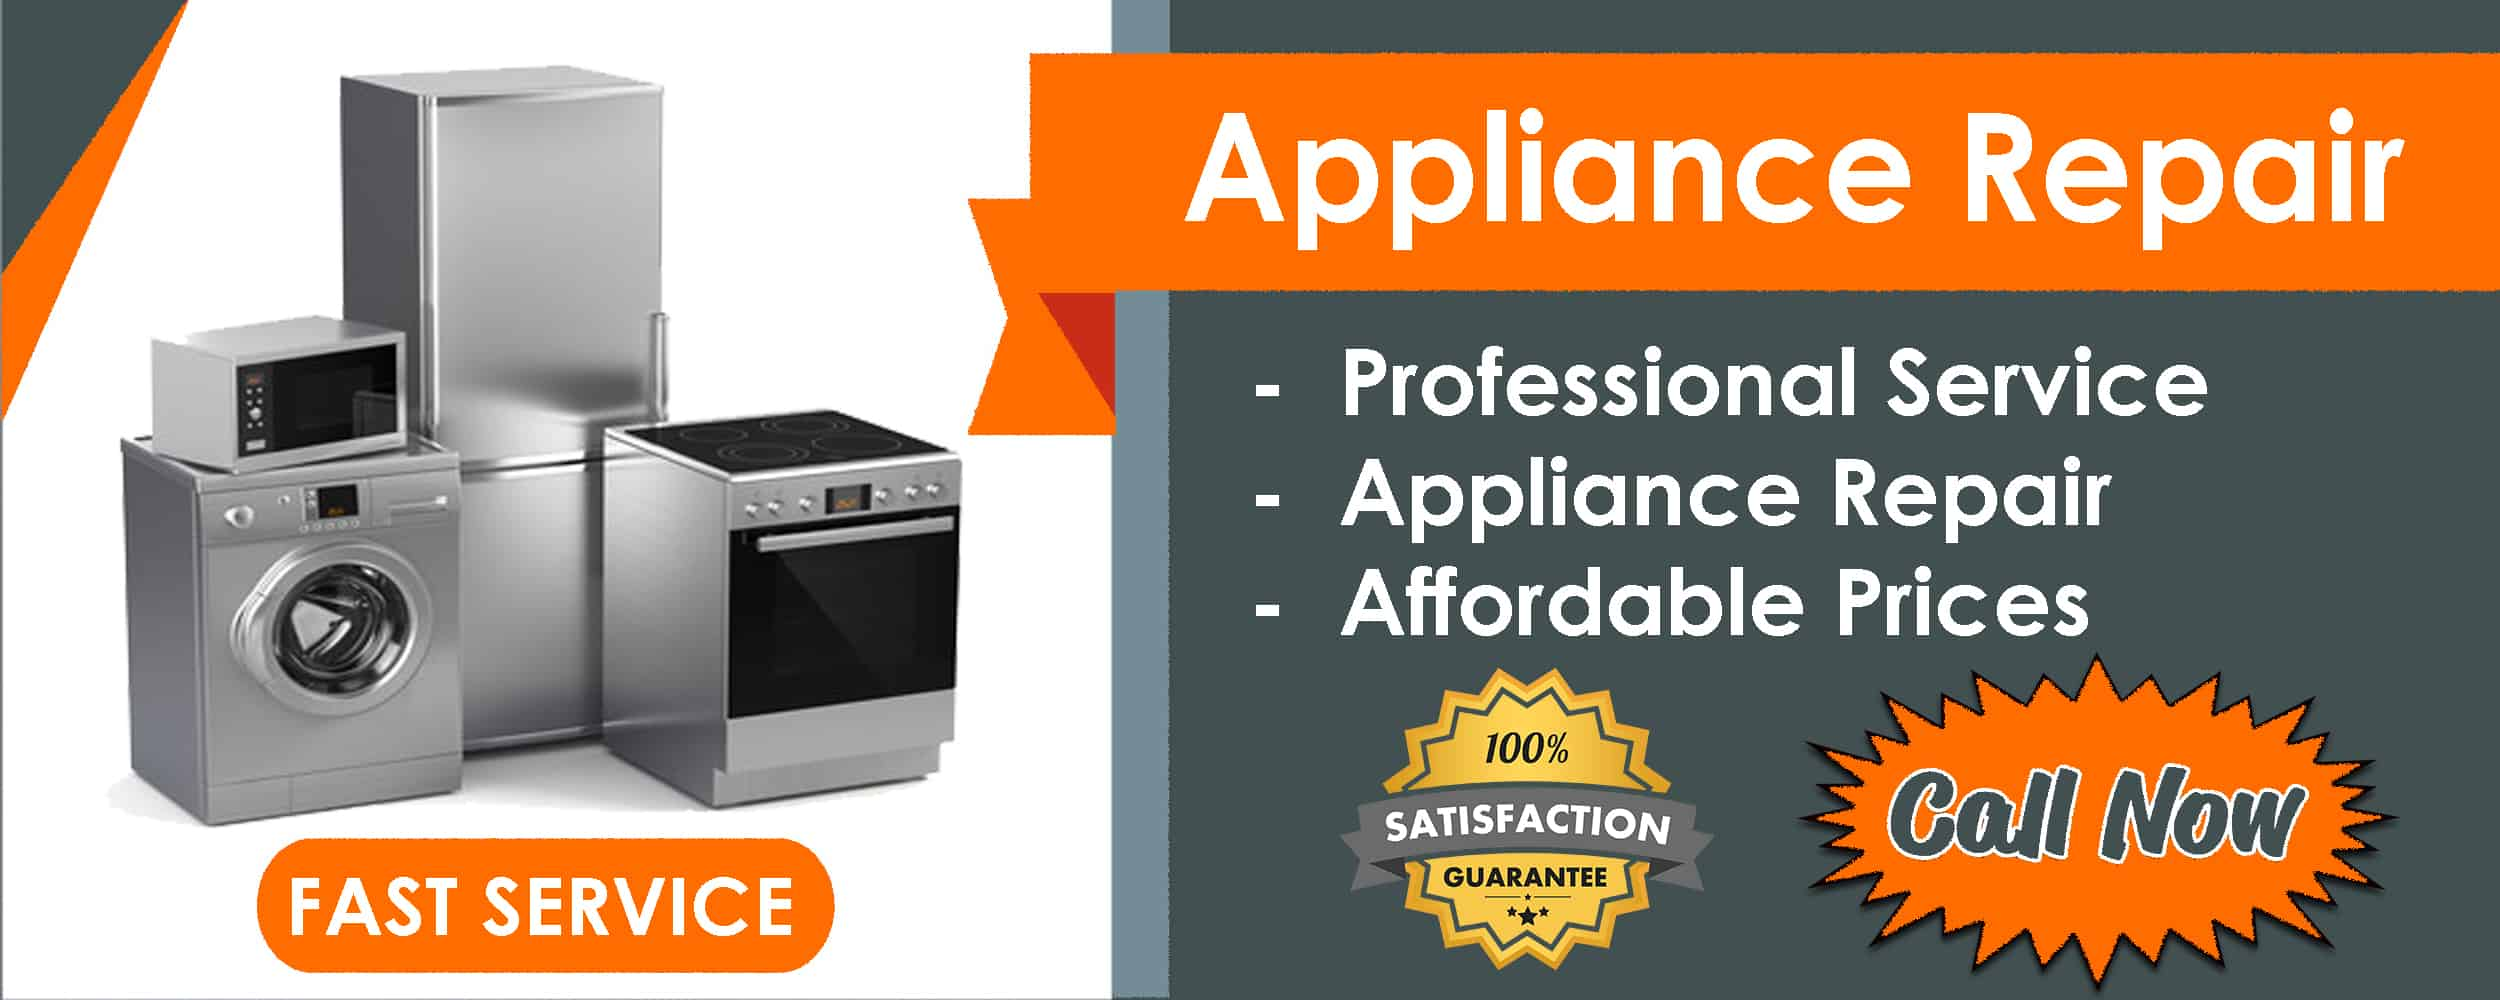 Appliance Repair Nashville Tn 615 570 4670 Nifty